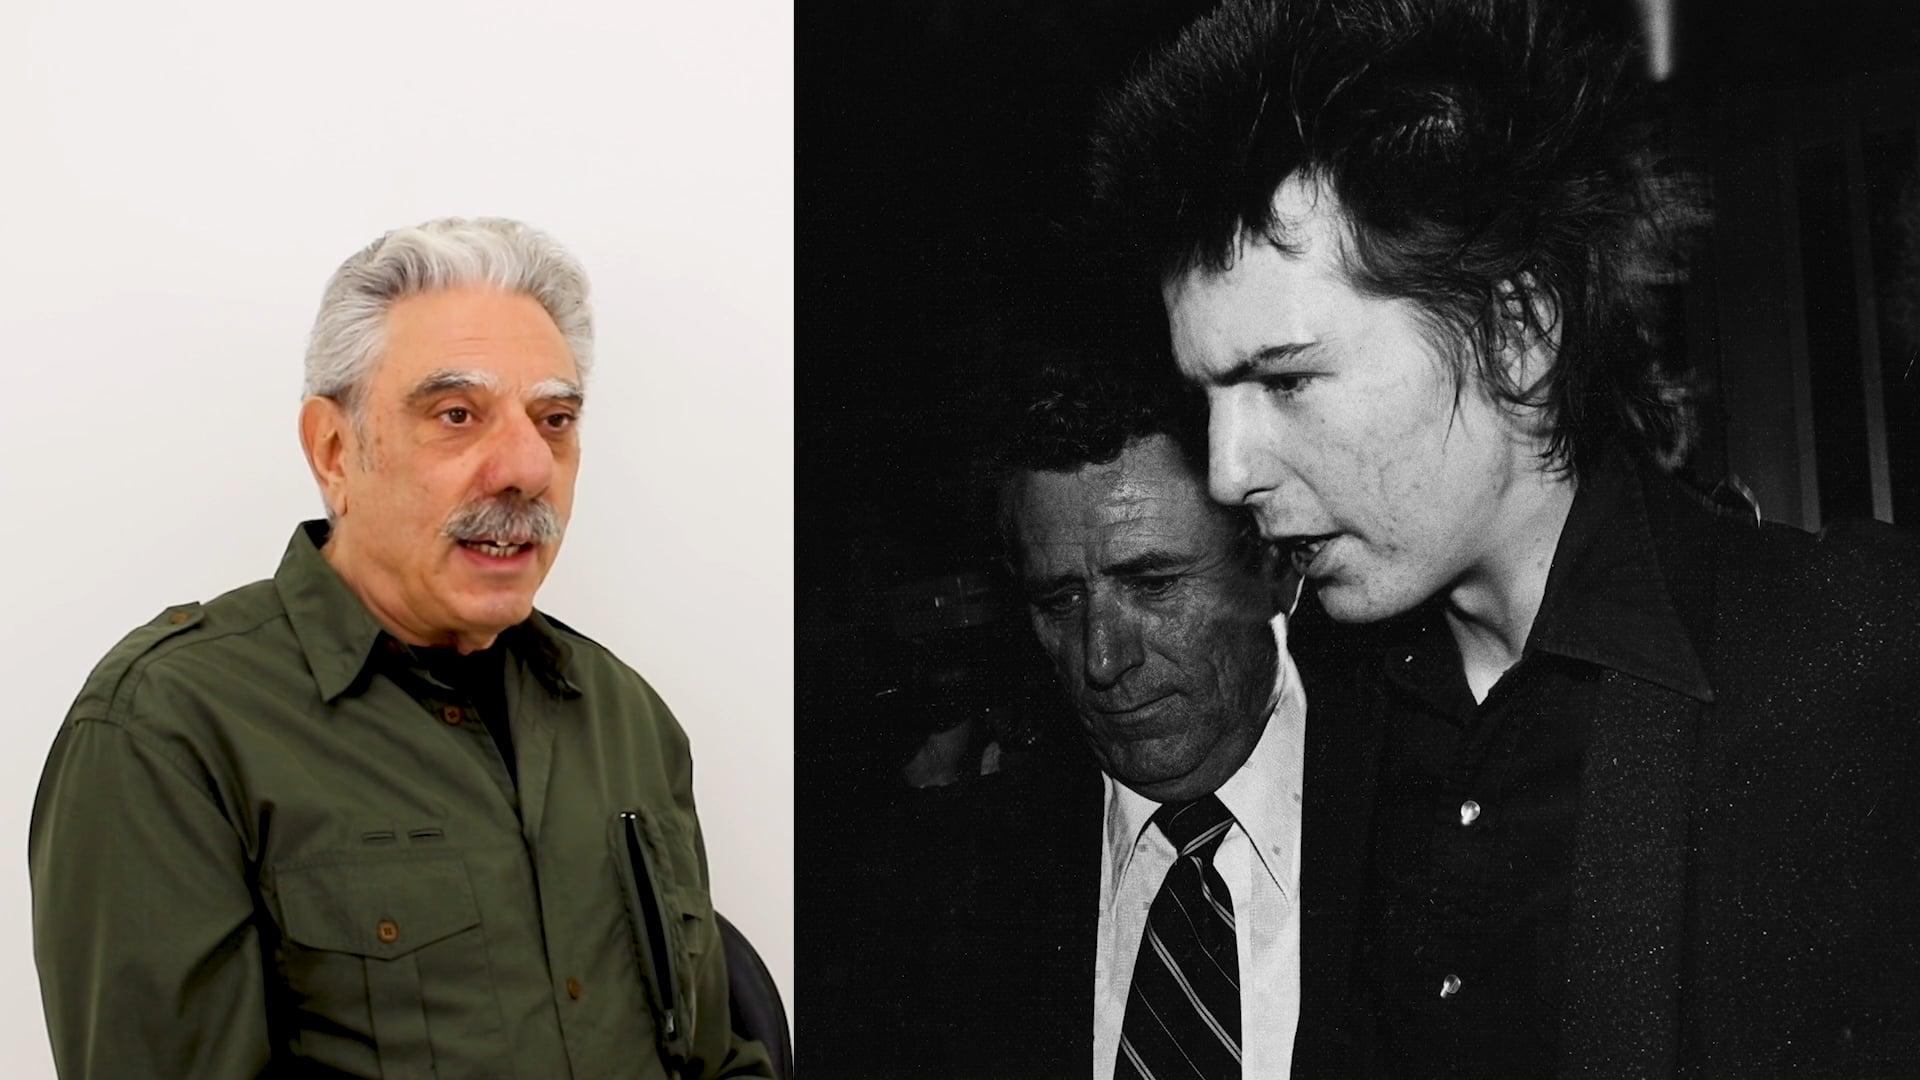 Photographer Allan Tannenbaum discusses Nancy Checks Out